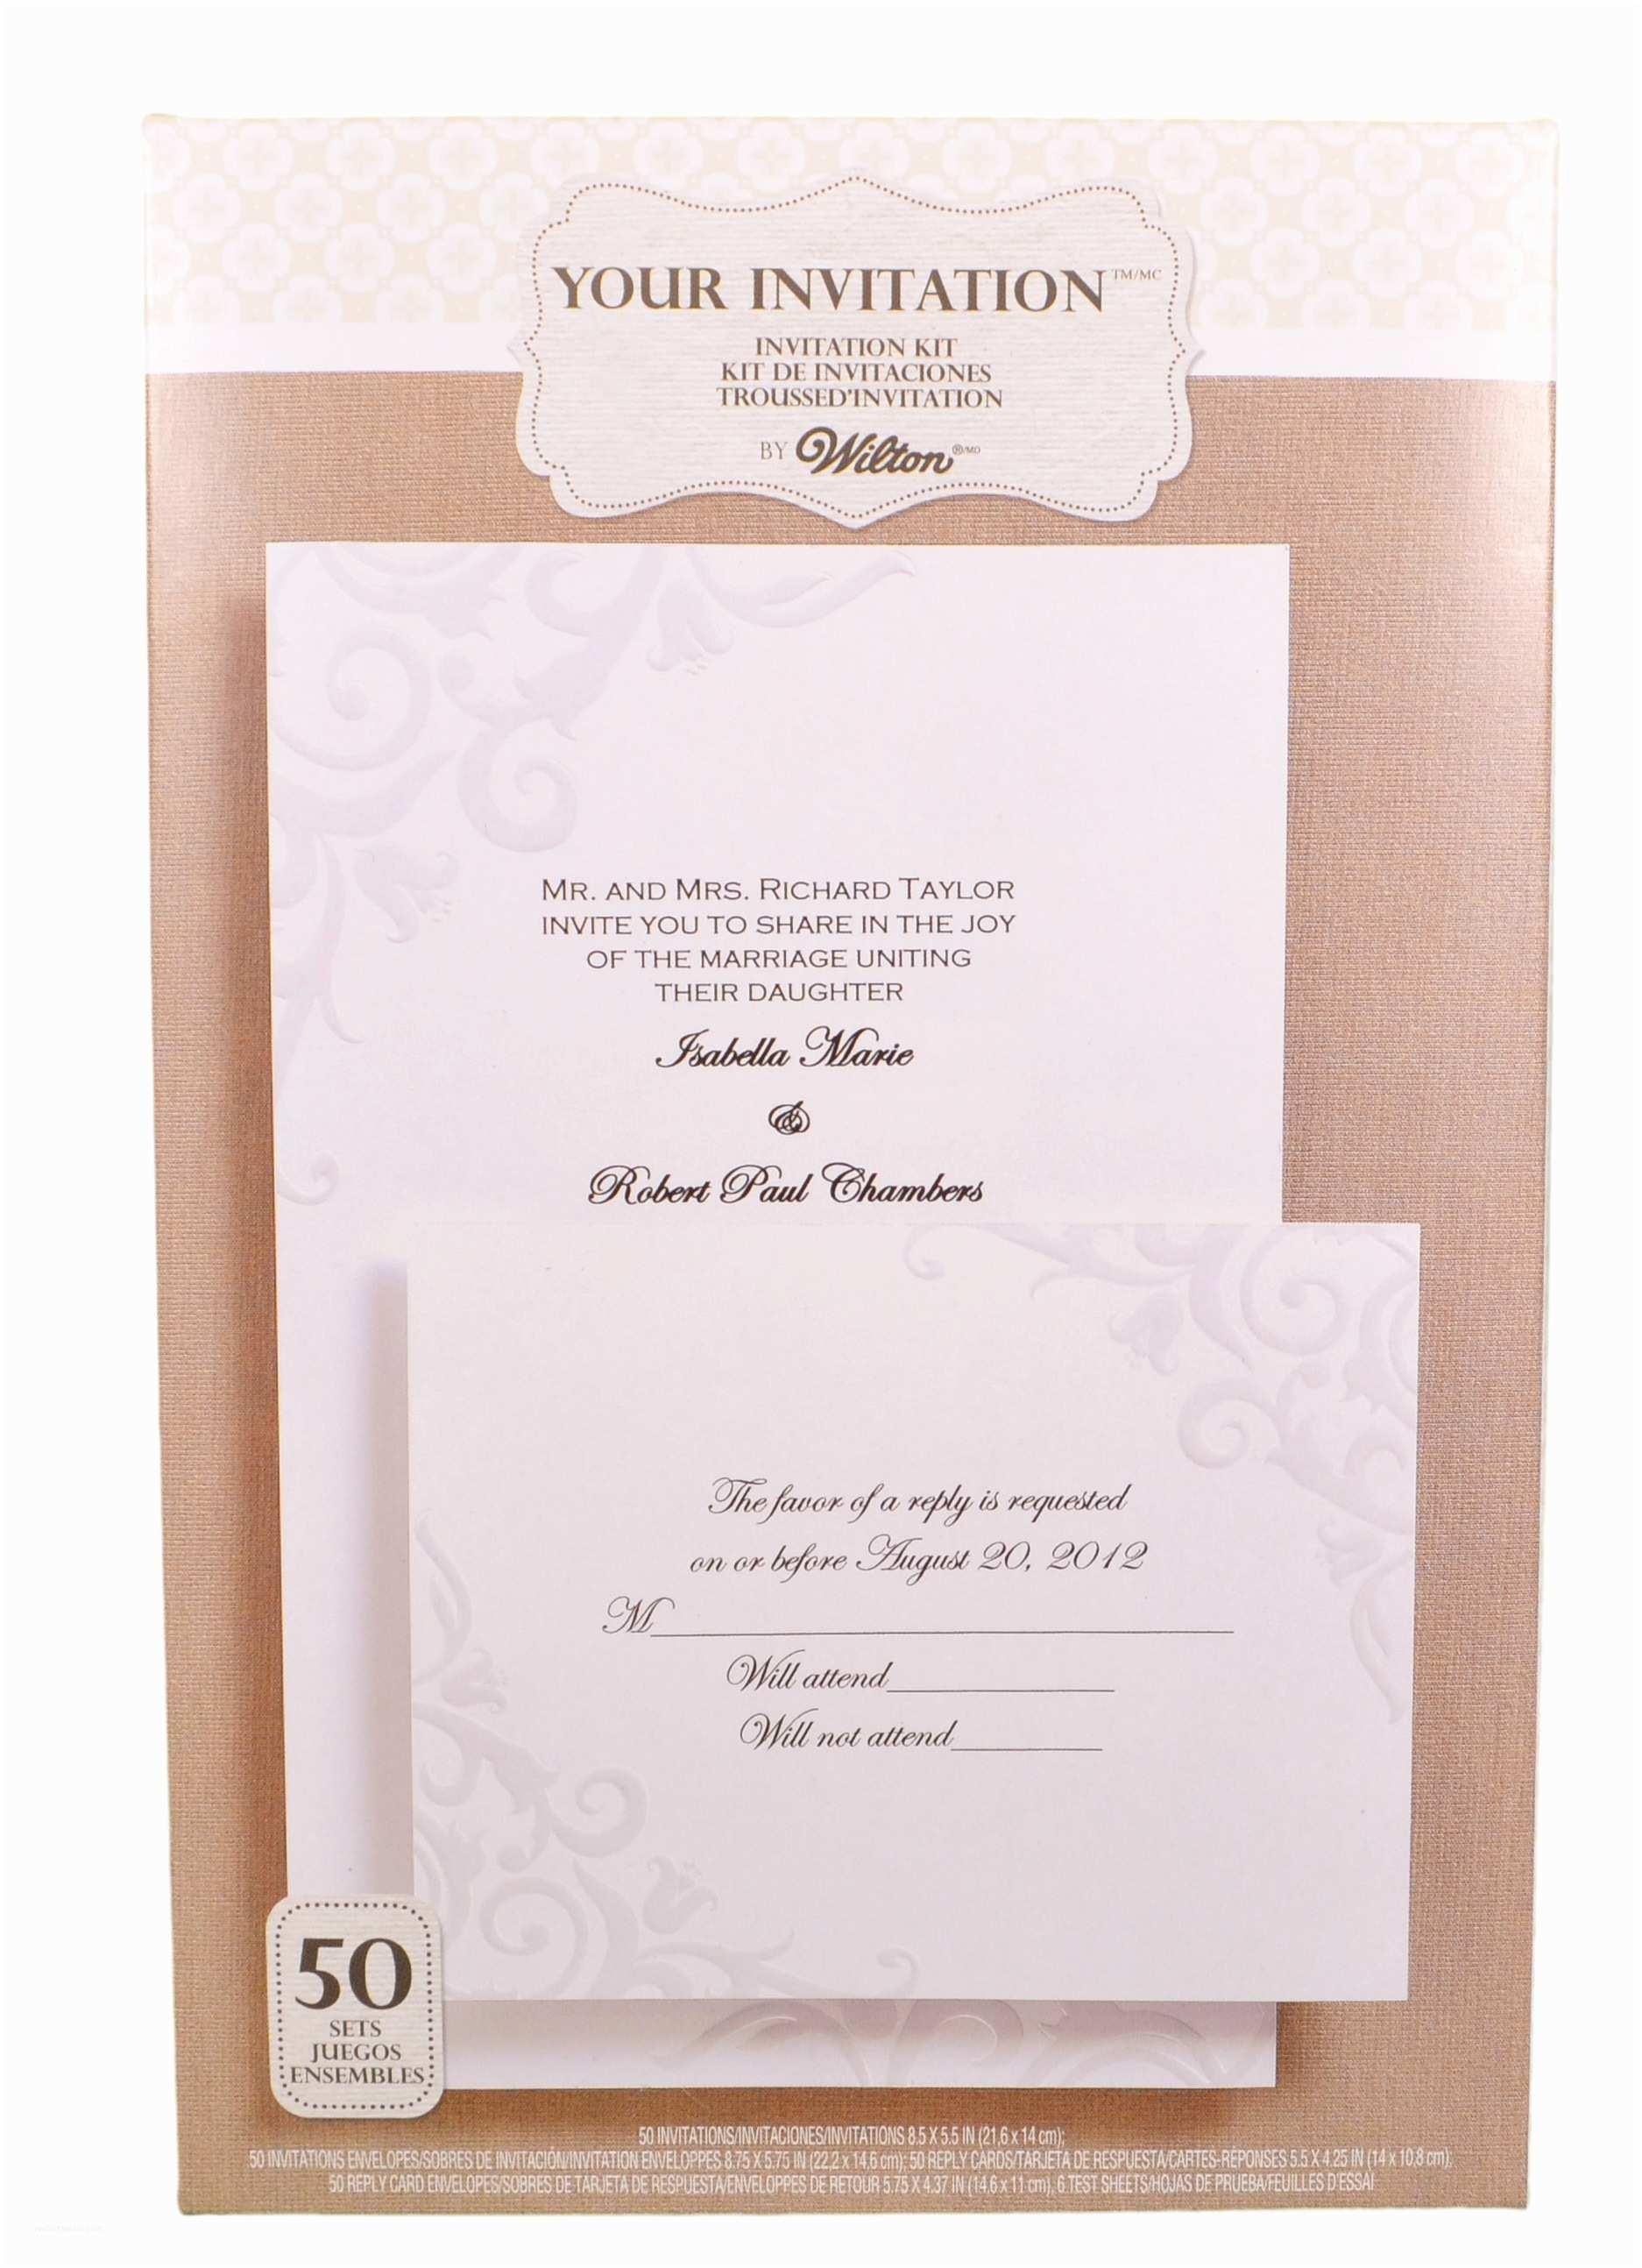 Wedding Invitation Kits Wilton Wedding Invitation Kit Lily Of the Valley Pearl 50